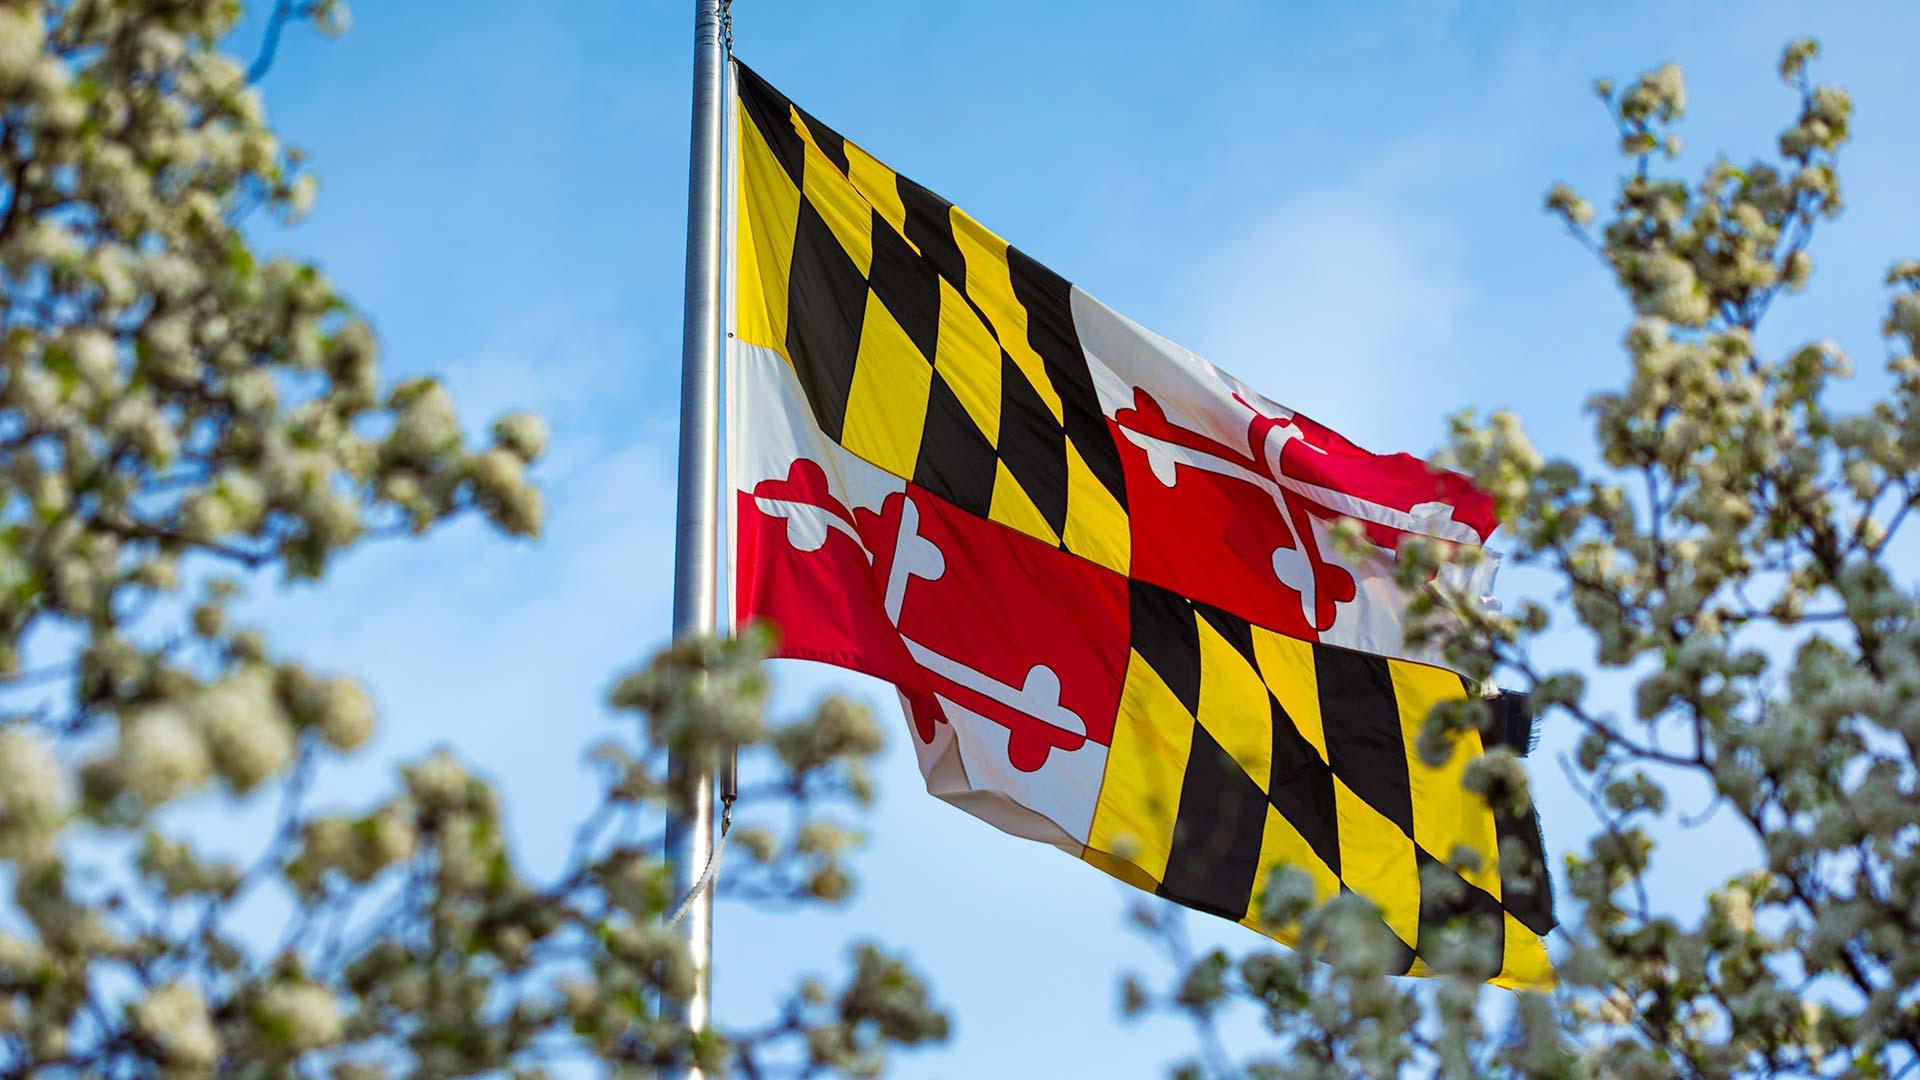 Maryland Flag on UMD's College Park Campus